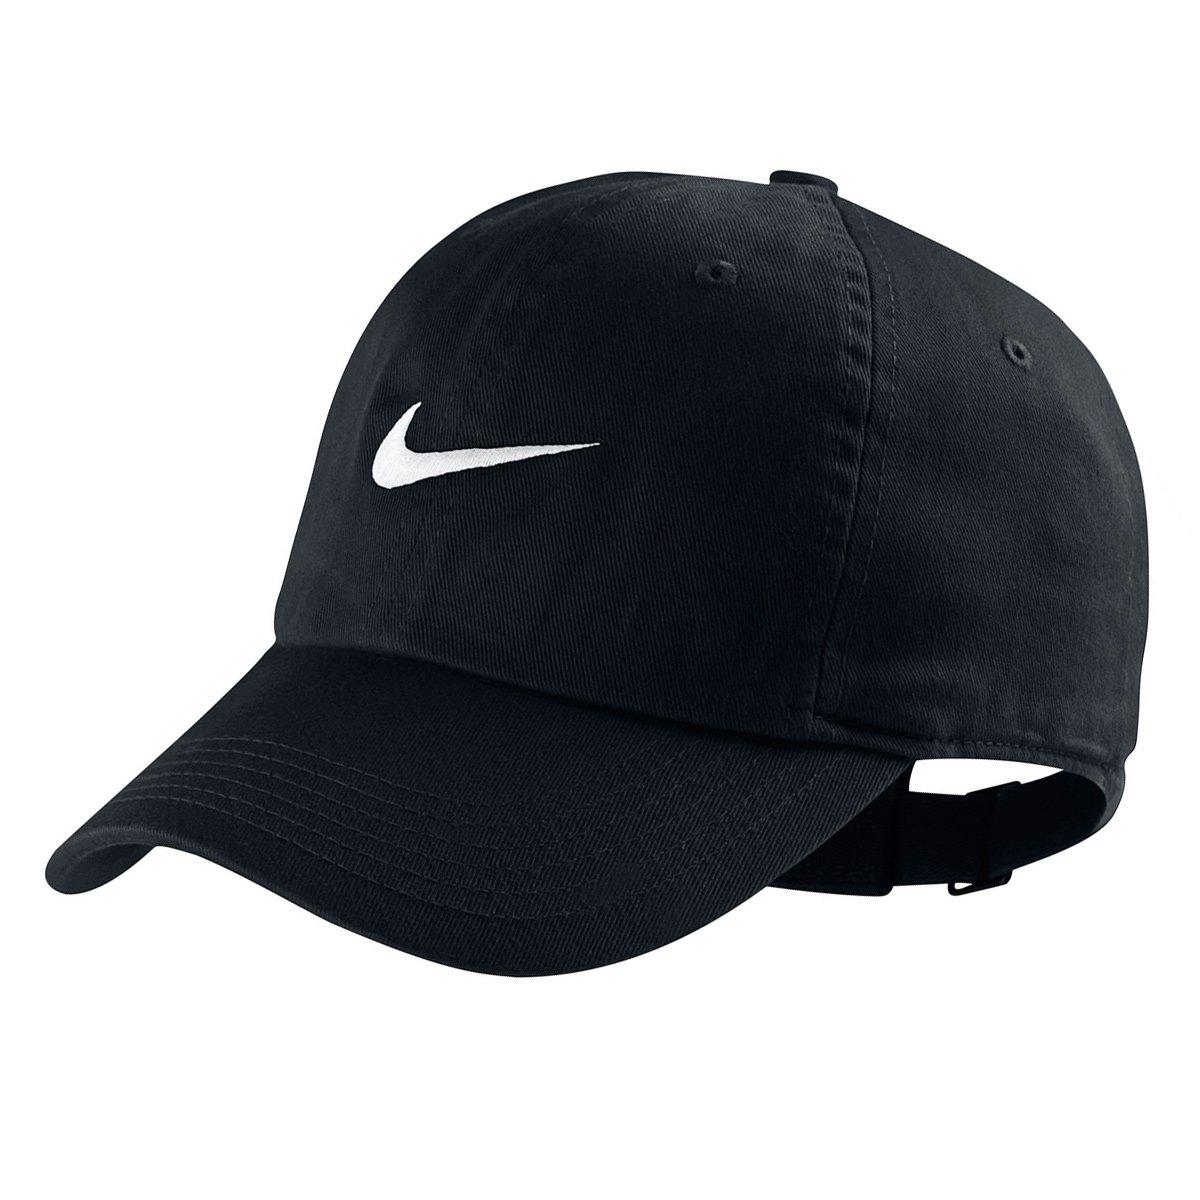 Boné Infantil Nike New Swoosh Heritage - Compre Agora  8de8b3d025b